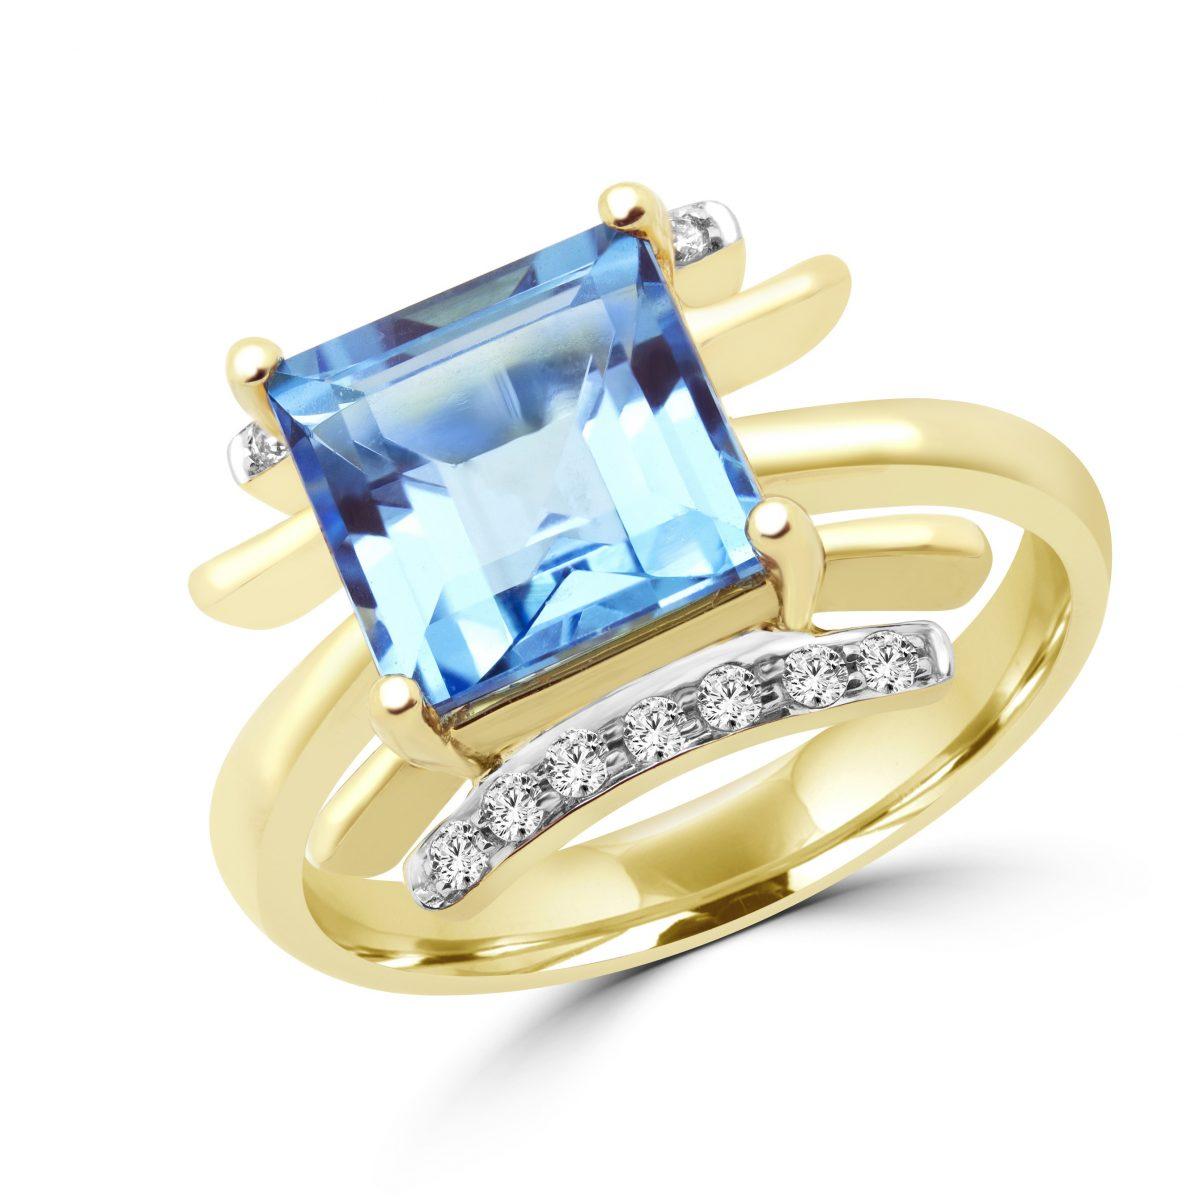 Emerald Cut Blue Topaz & Diamond Cocktail Ring In 10k